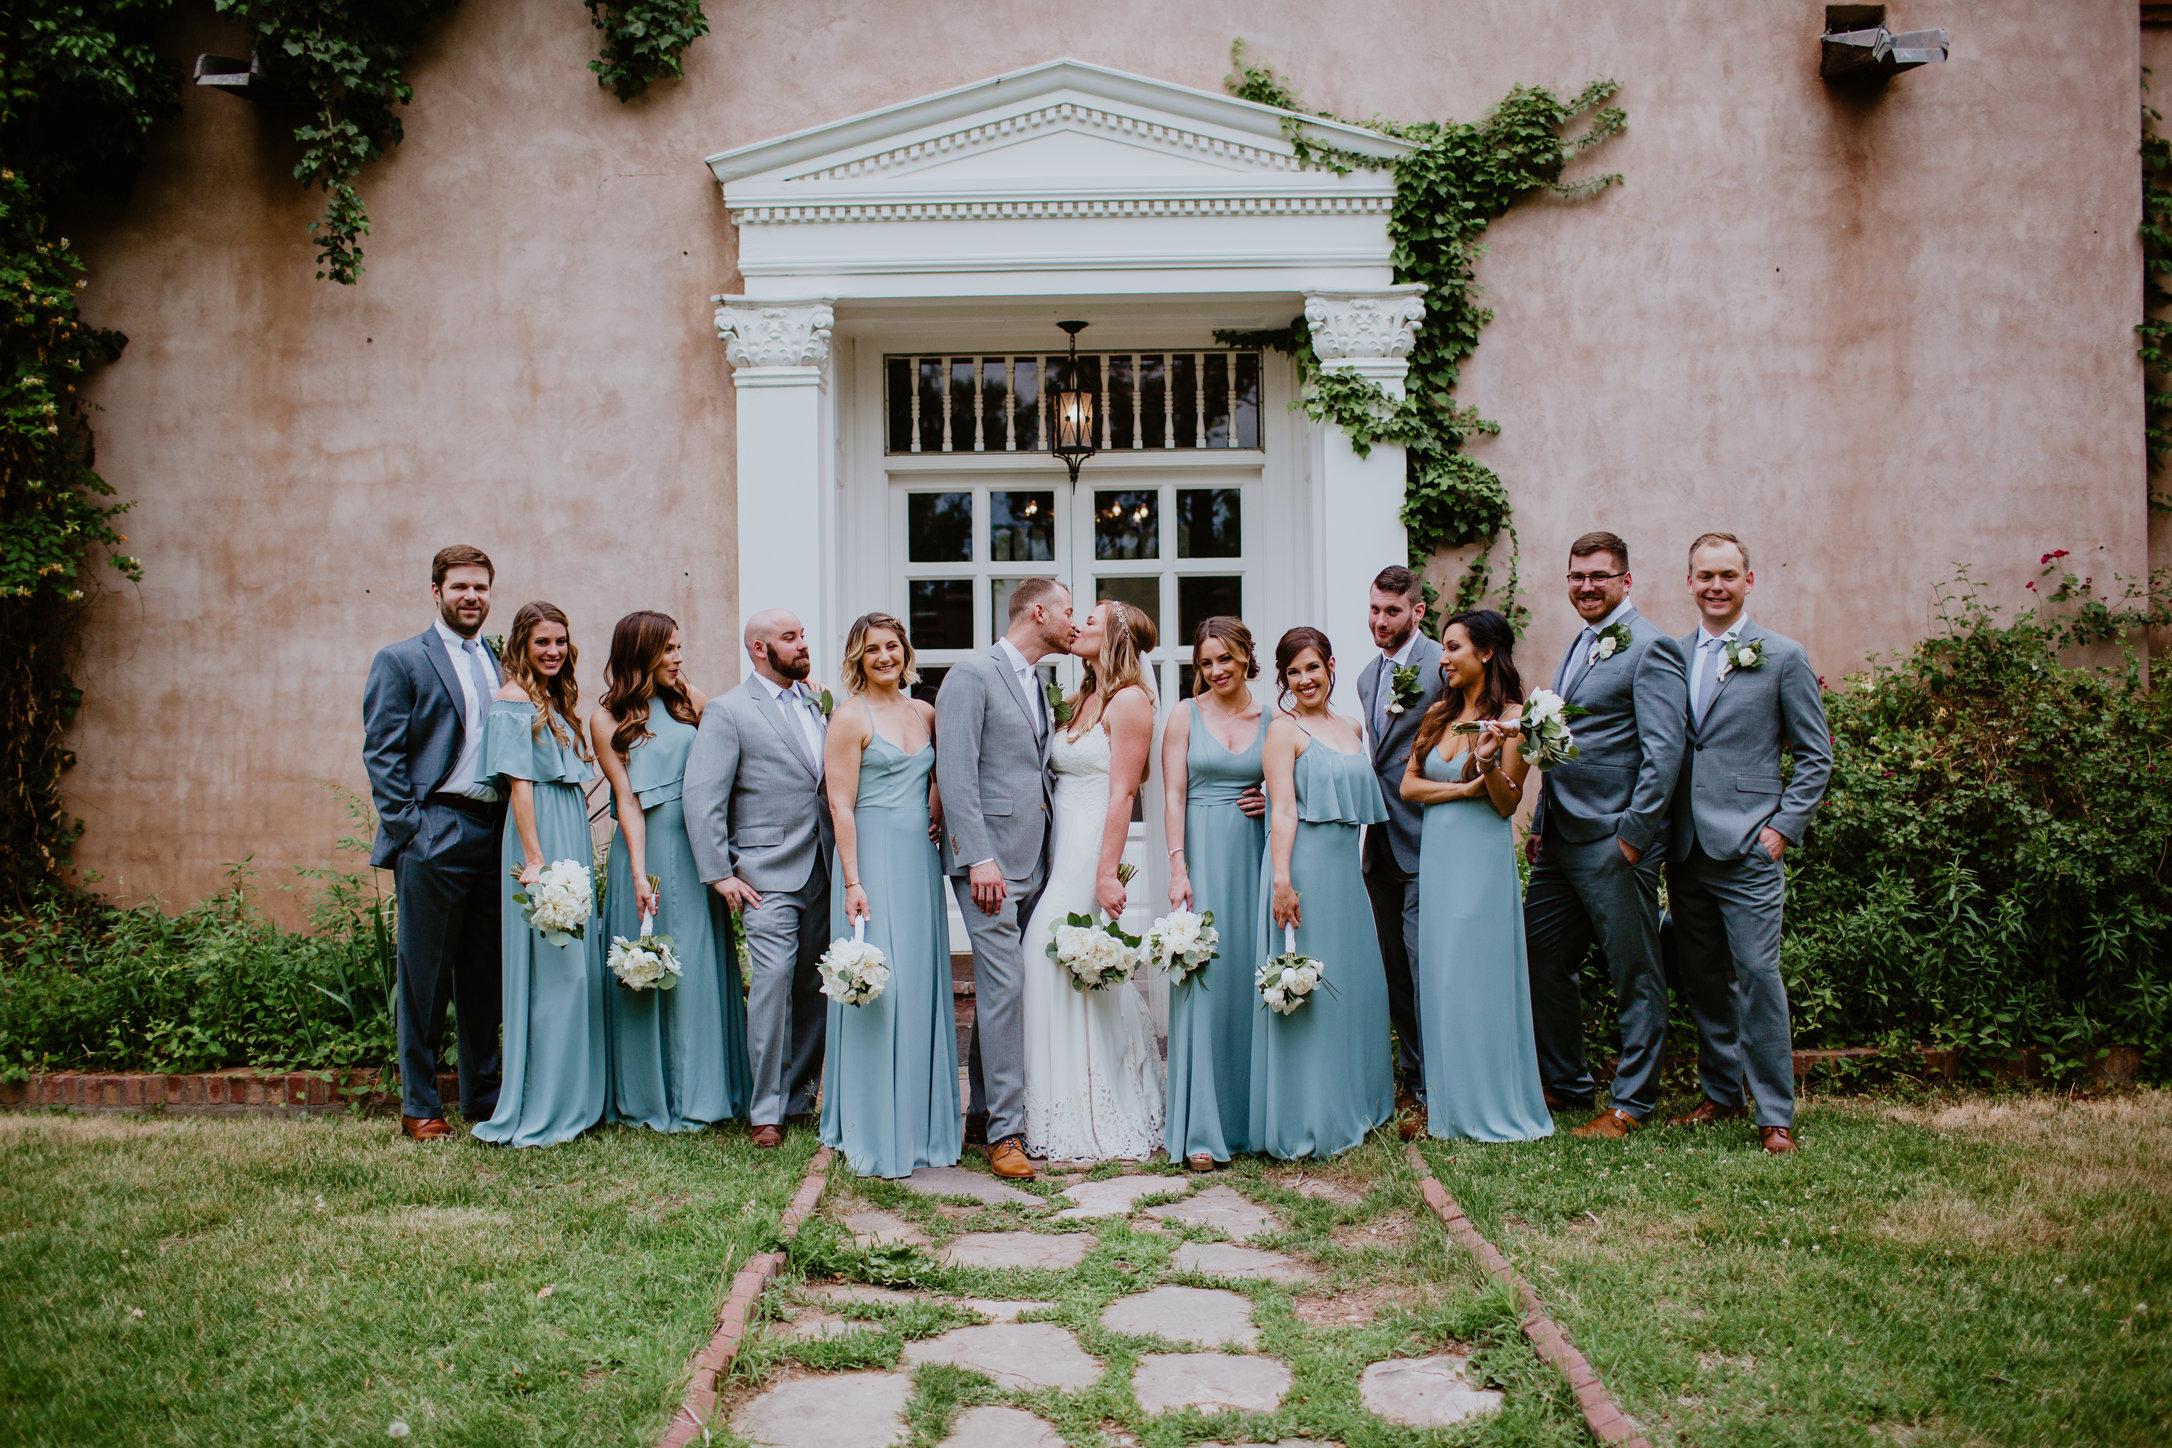 DandA-wedding-422.jpg